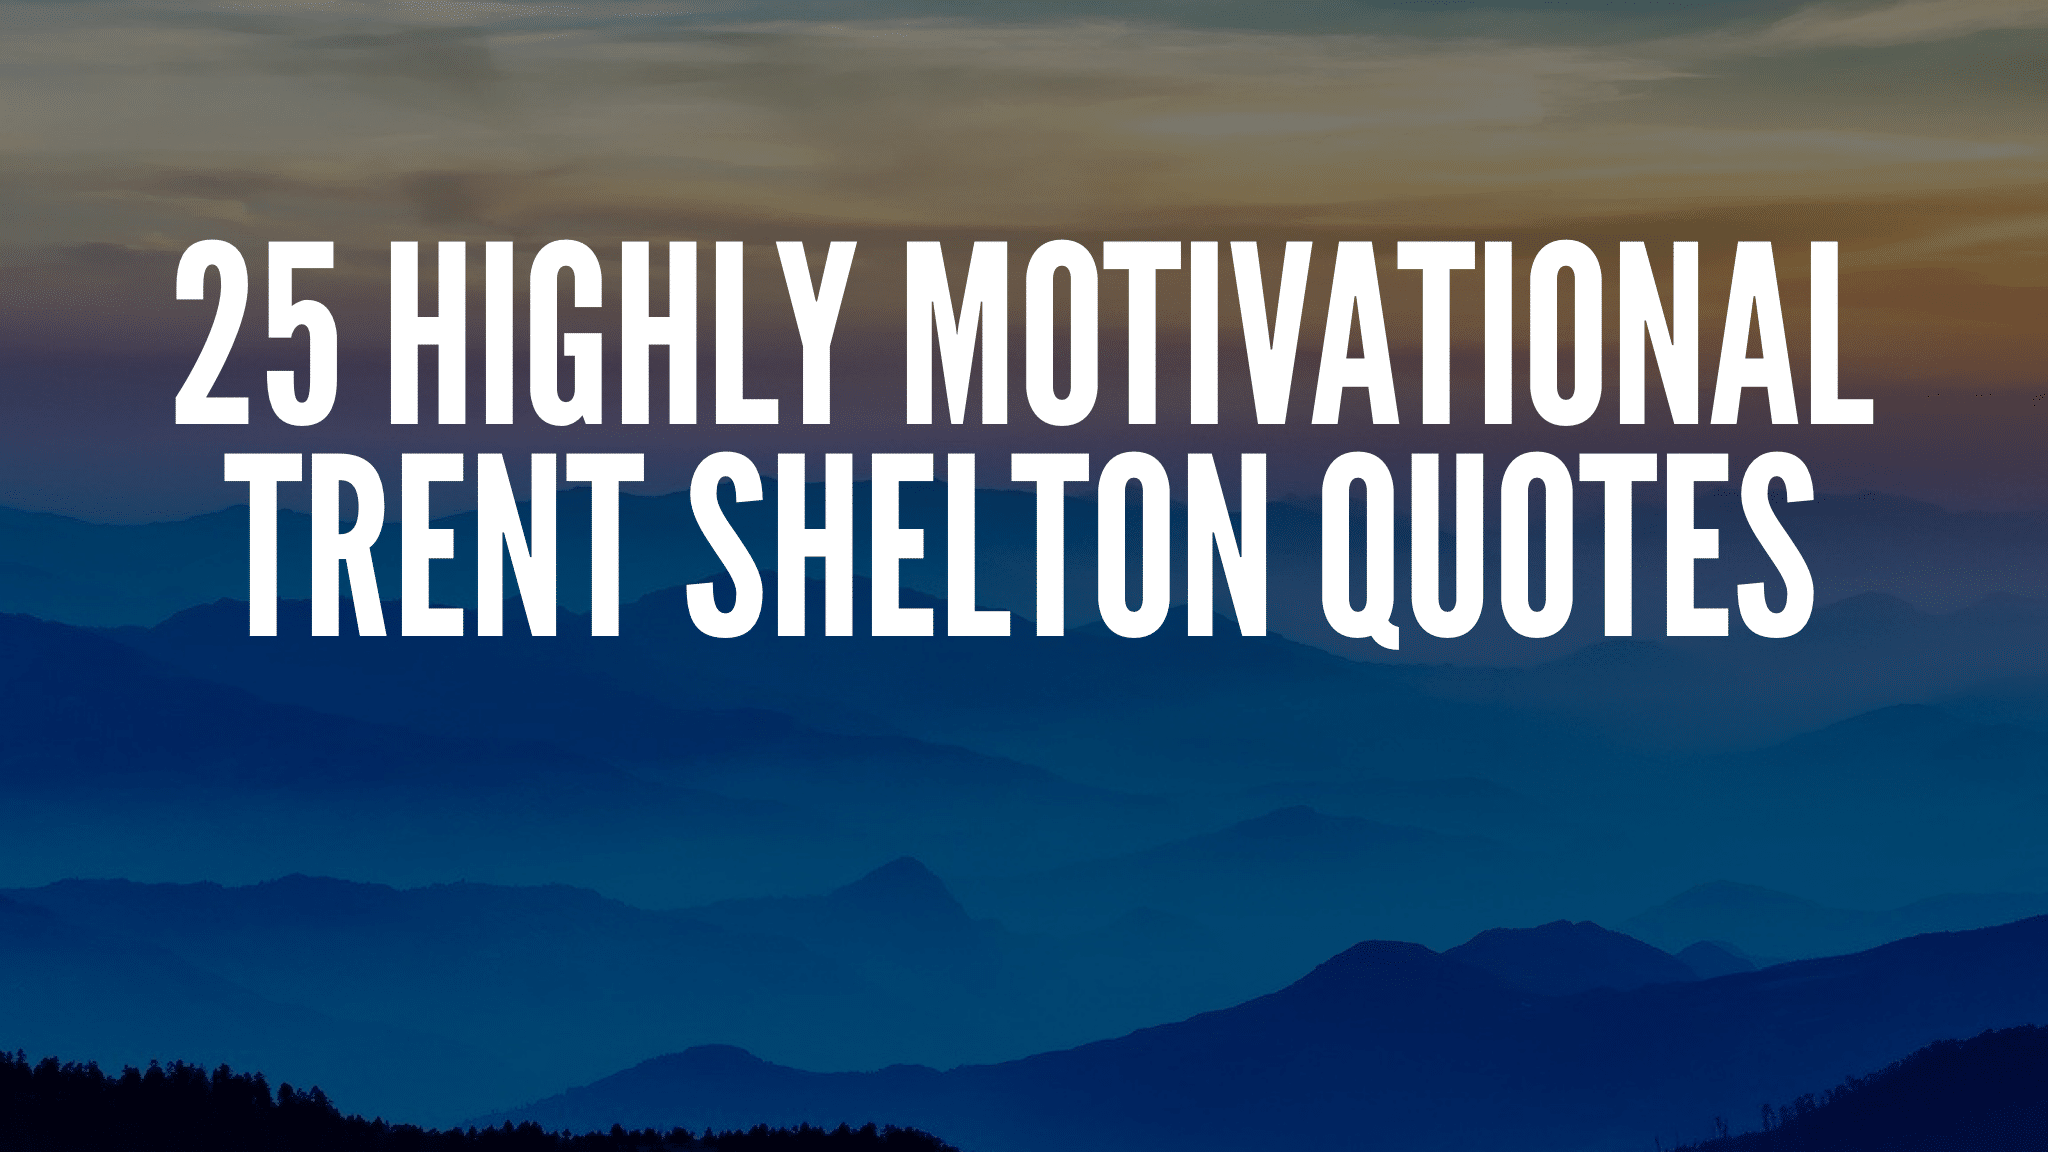 Motivational Trent Shelton Quotes